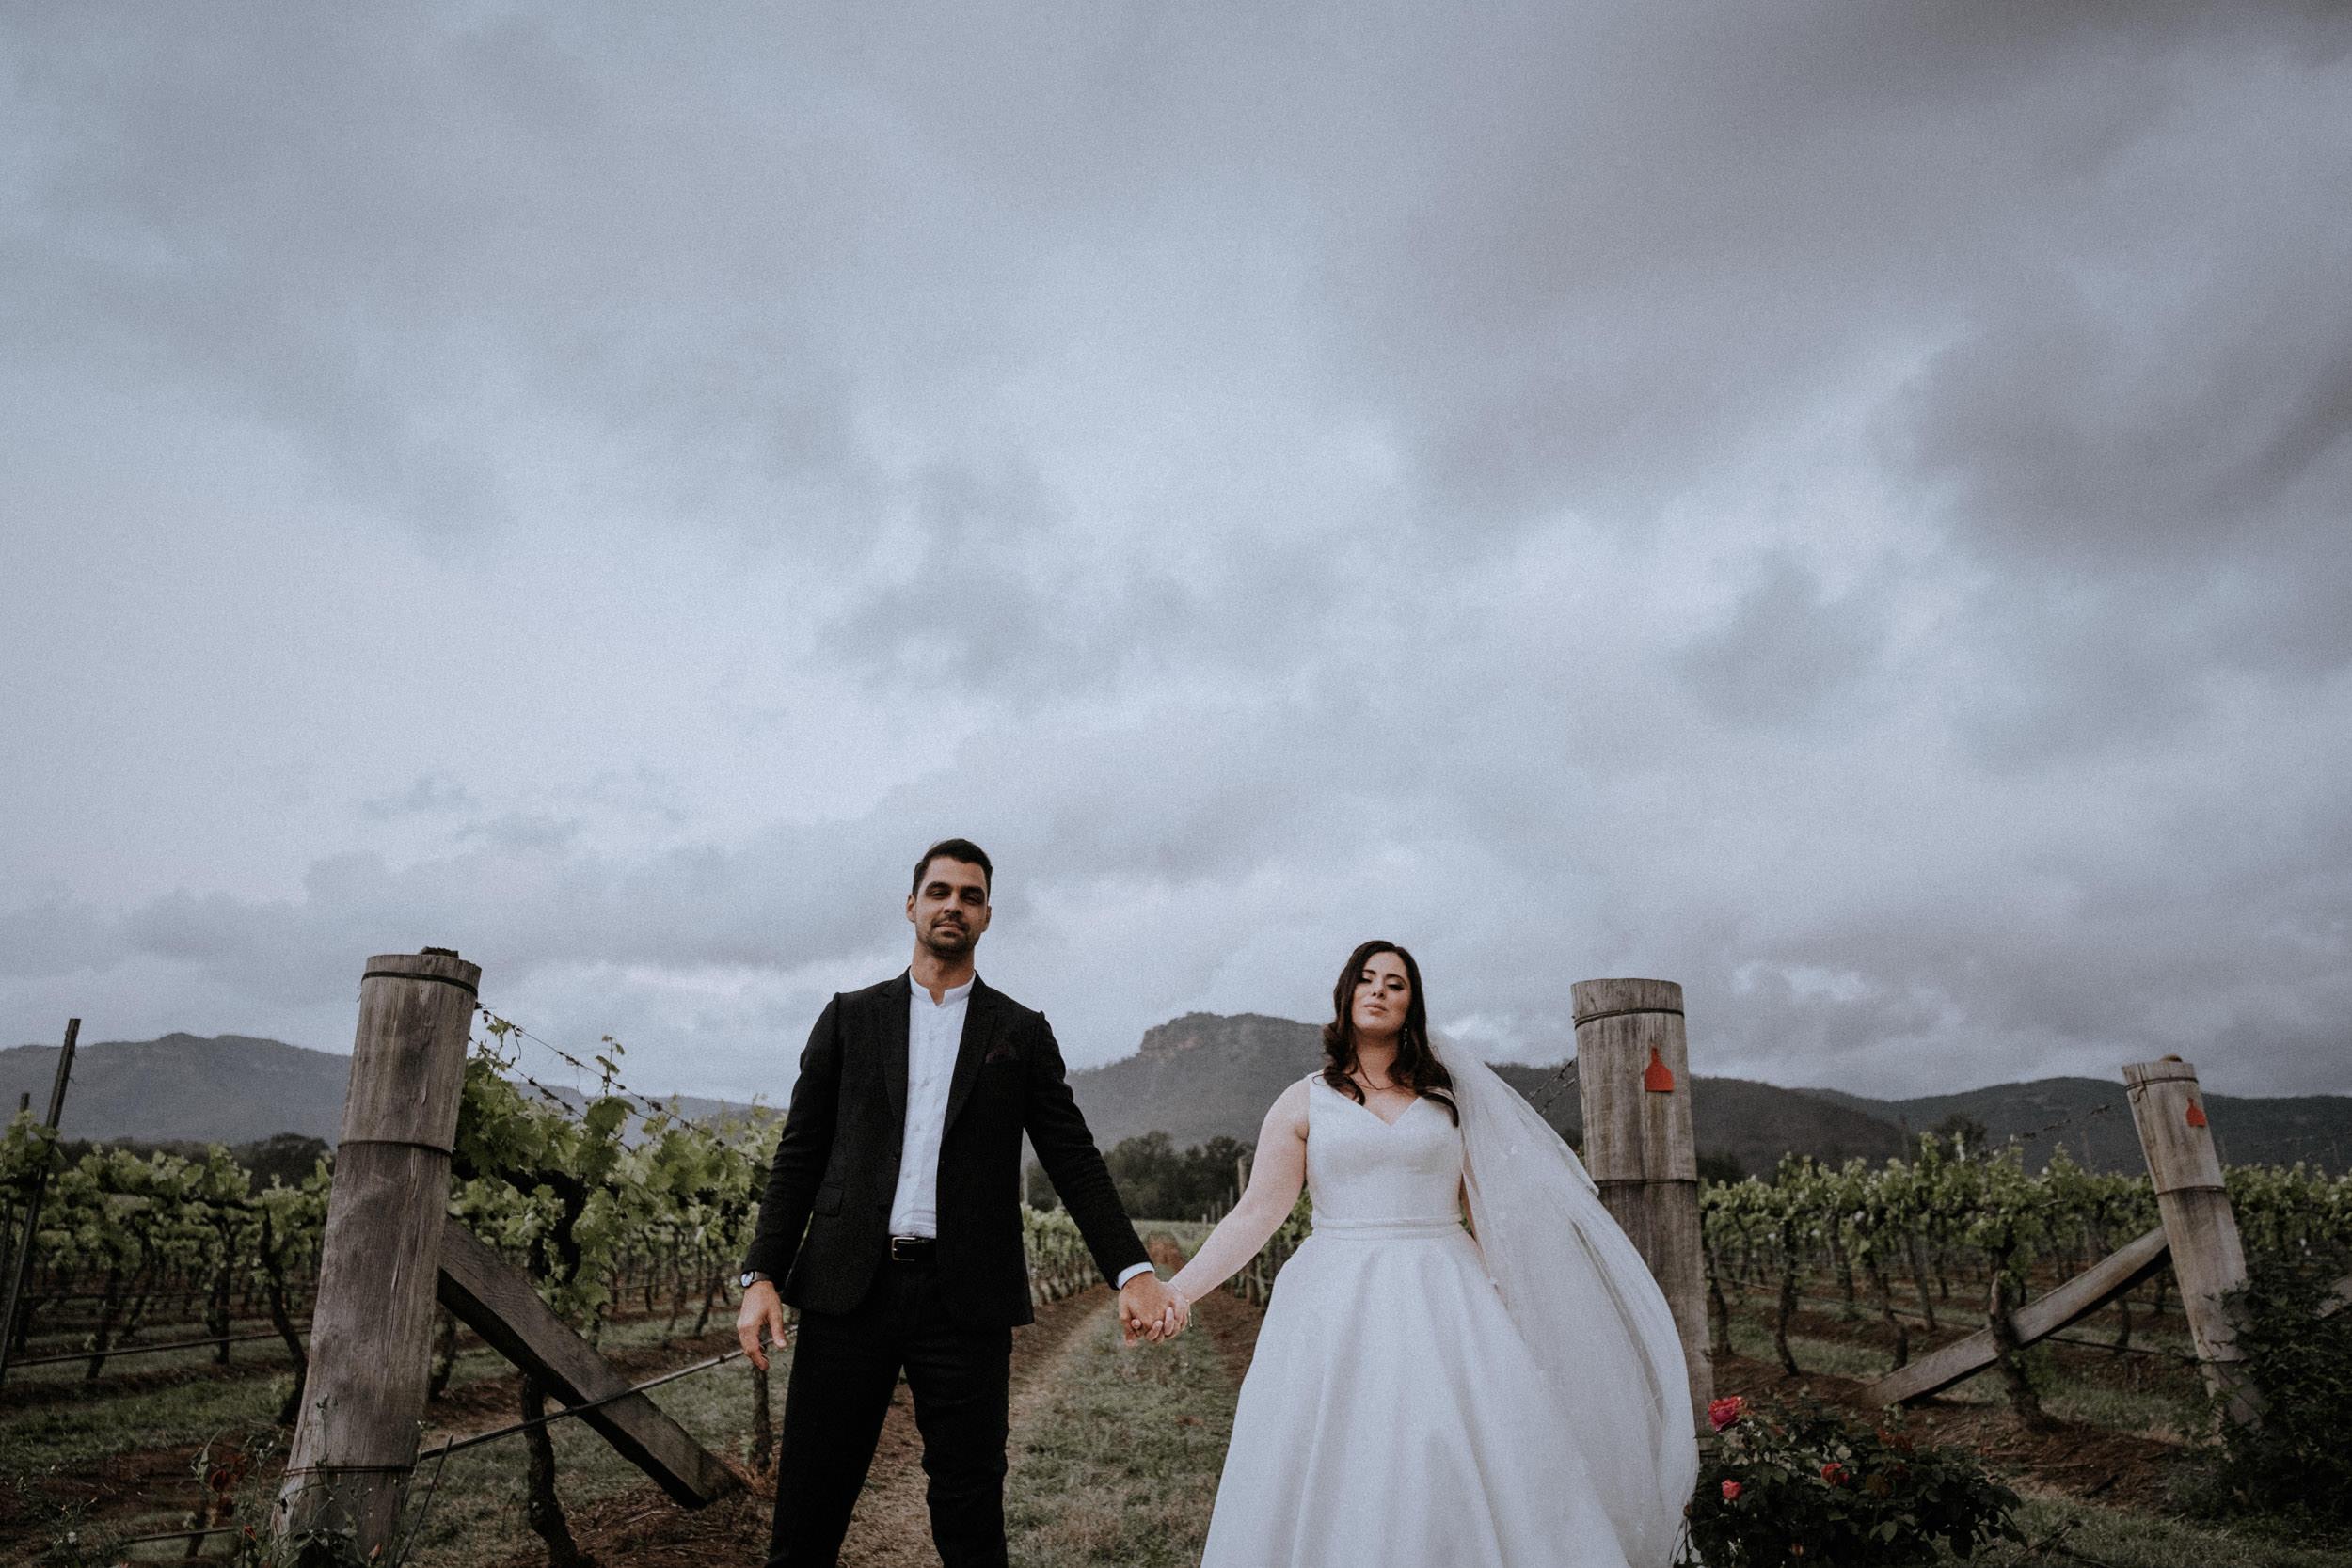 s+j_top_elopement wedding photography_kings & thieves_blog - 428.jpg